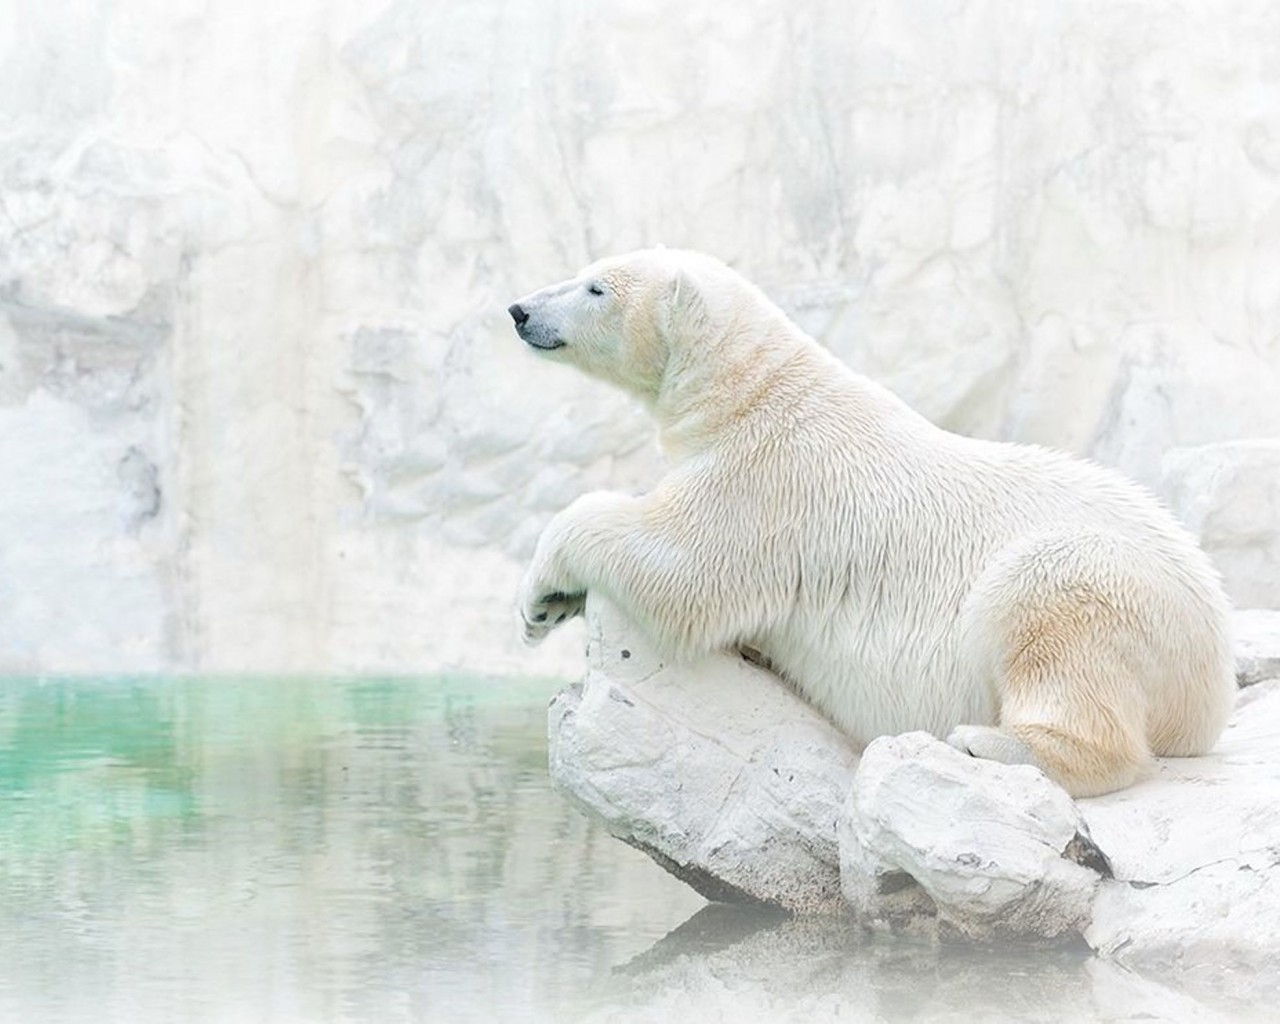 polar bear wallpaper free hd animal downloads. Black Bedroom Furniture Sets. Home Design Ideas